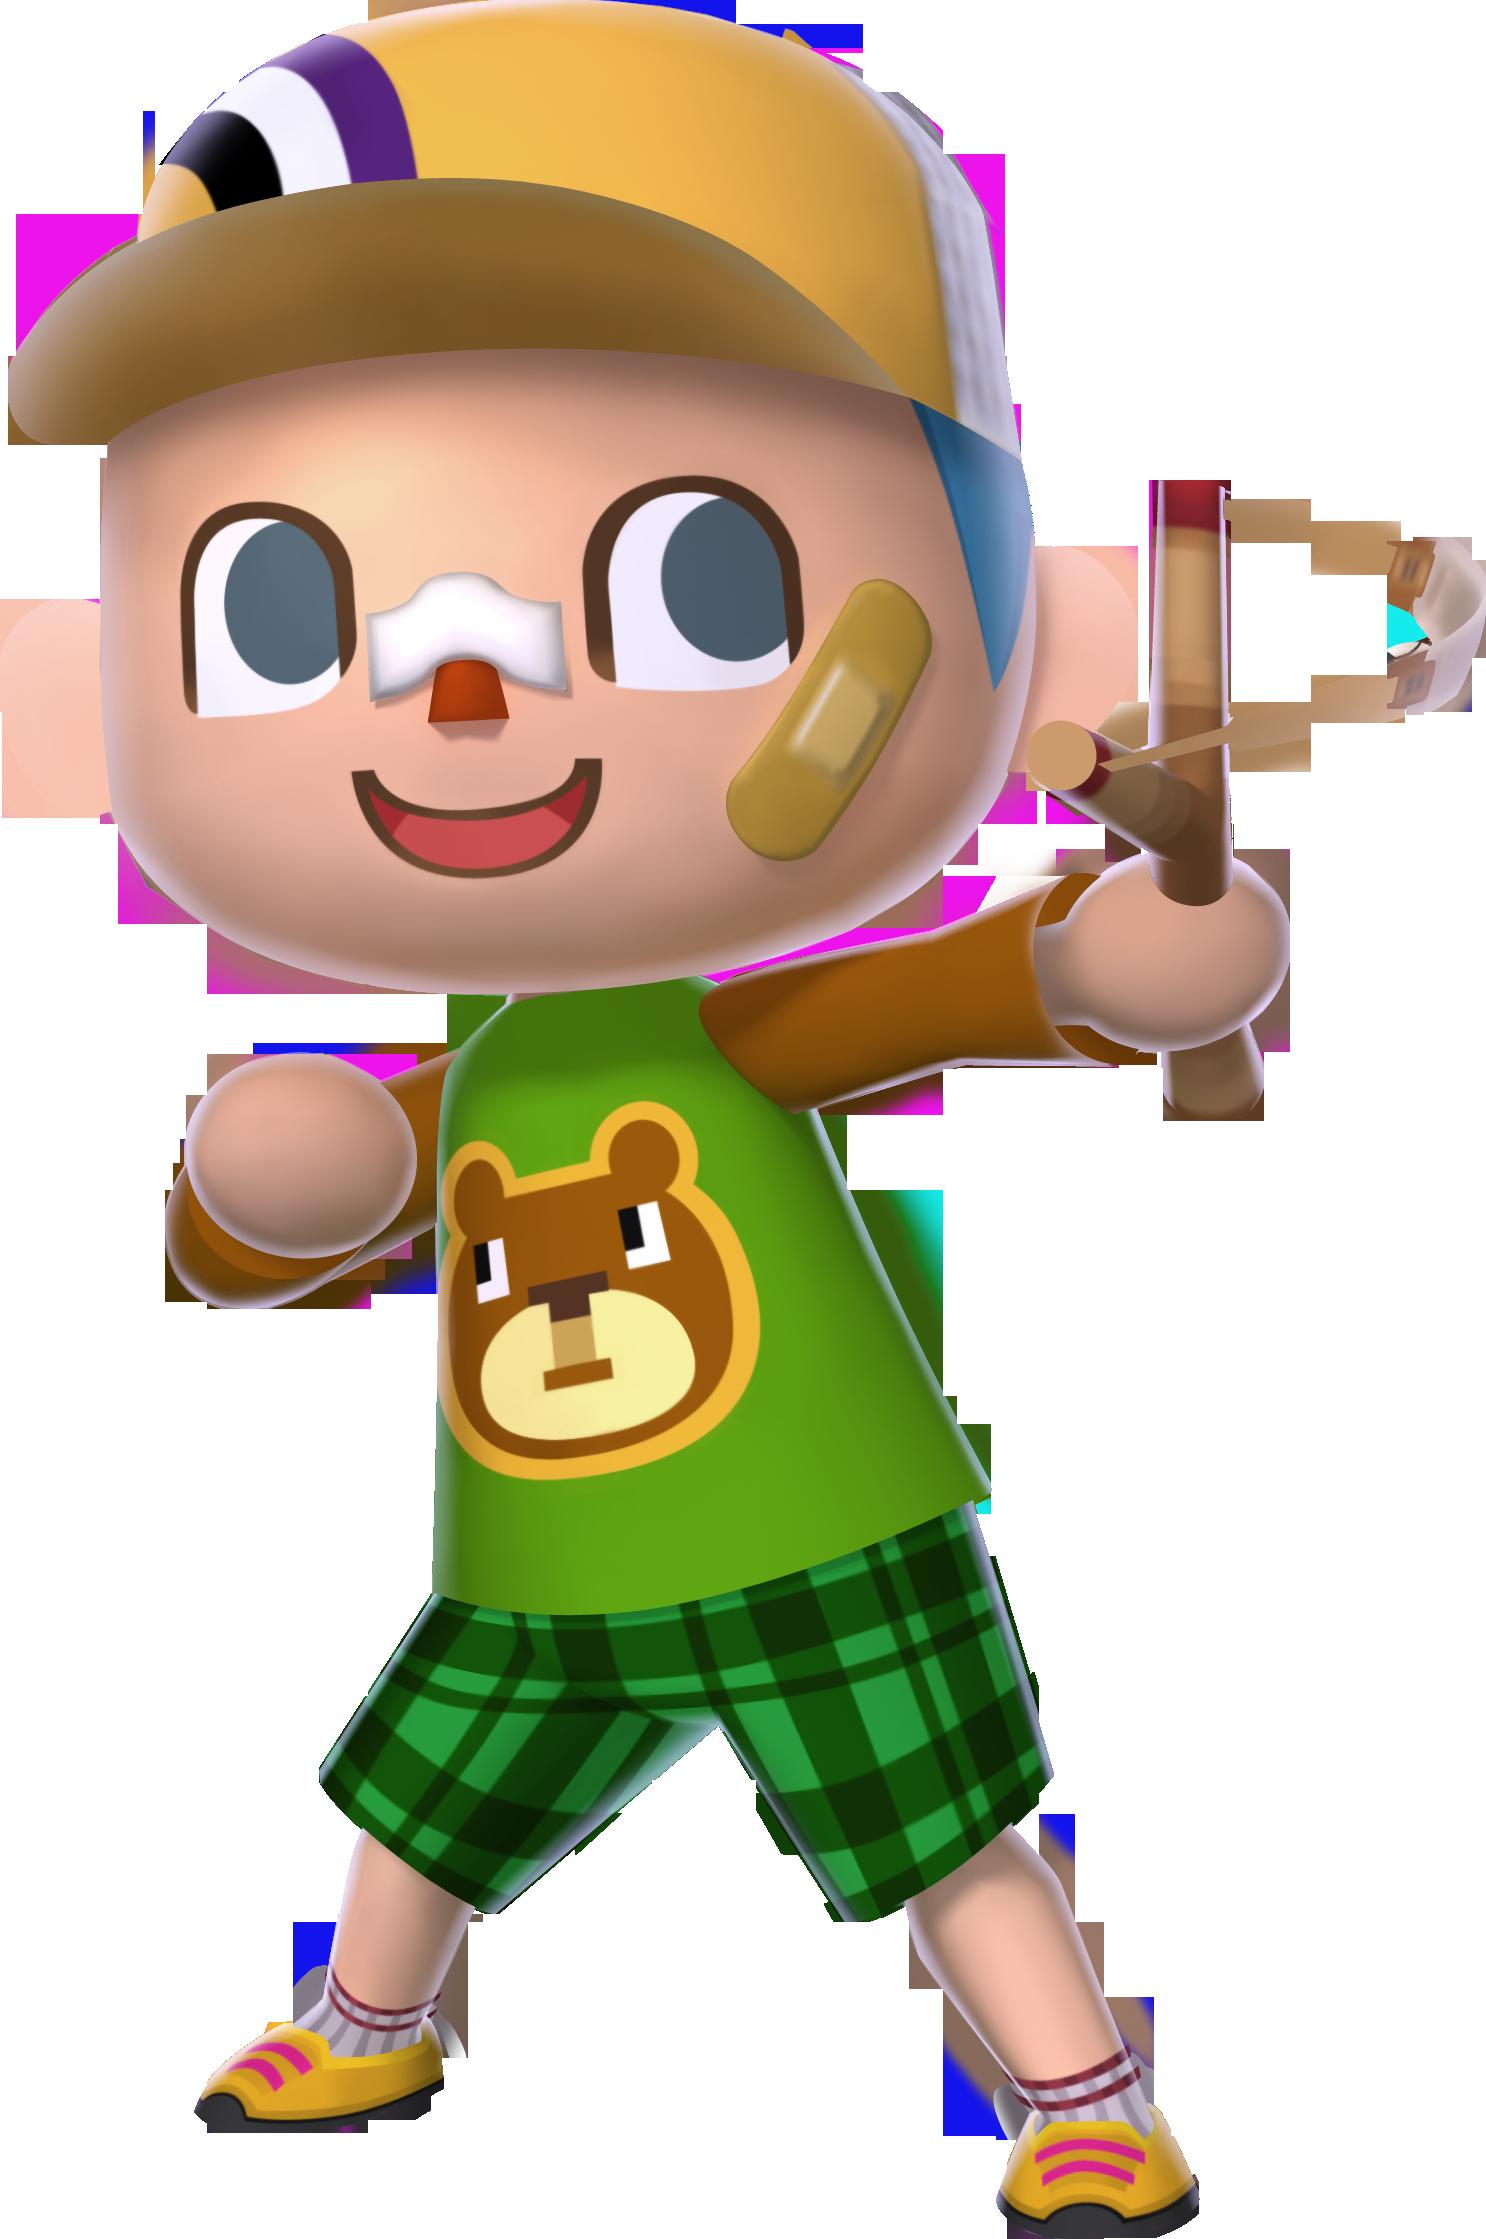 Png Royalty Free Boy Transparent Animal Crossing - Animal ...